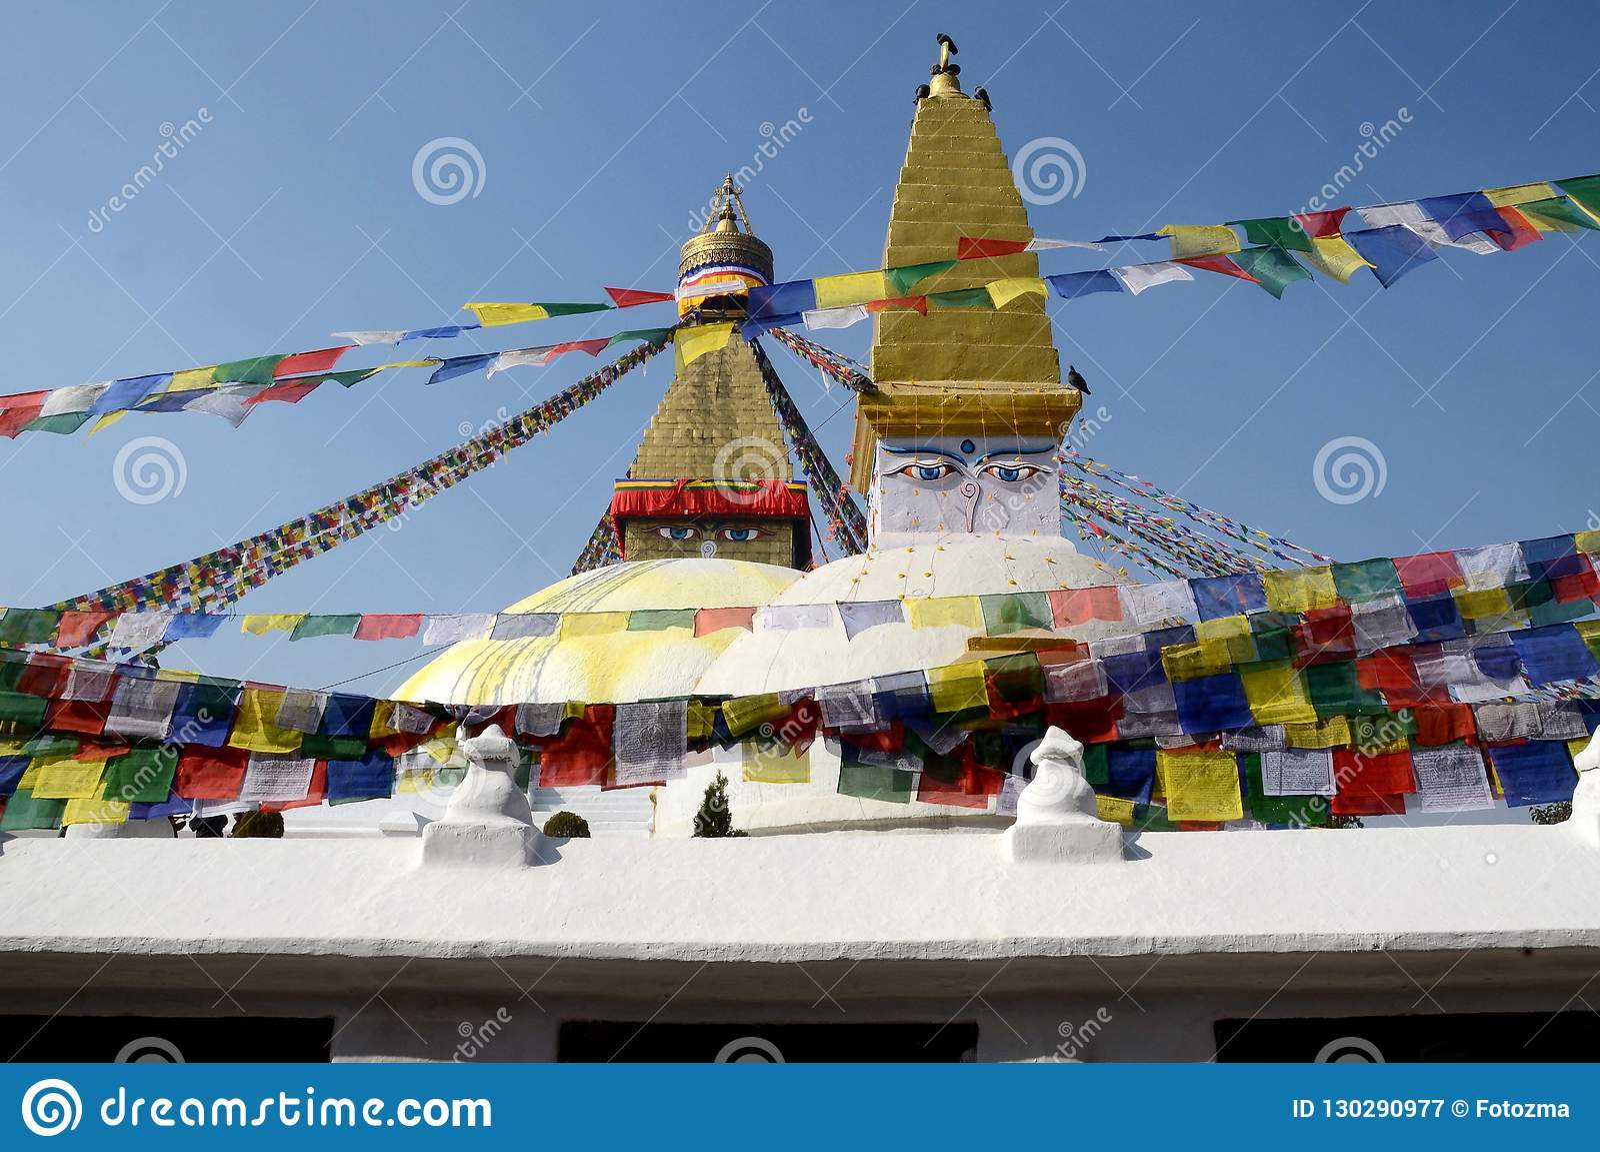 Tour Nepal Banners Washing Machine Banners